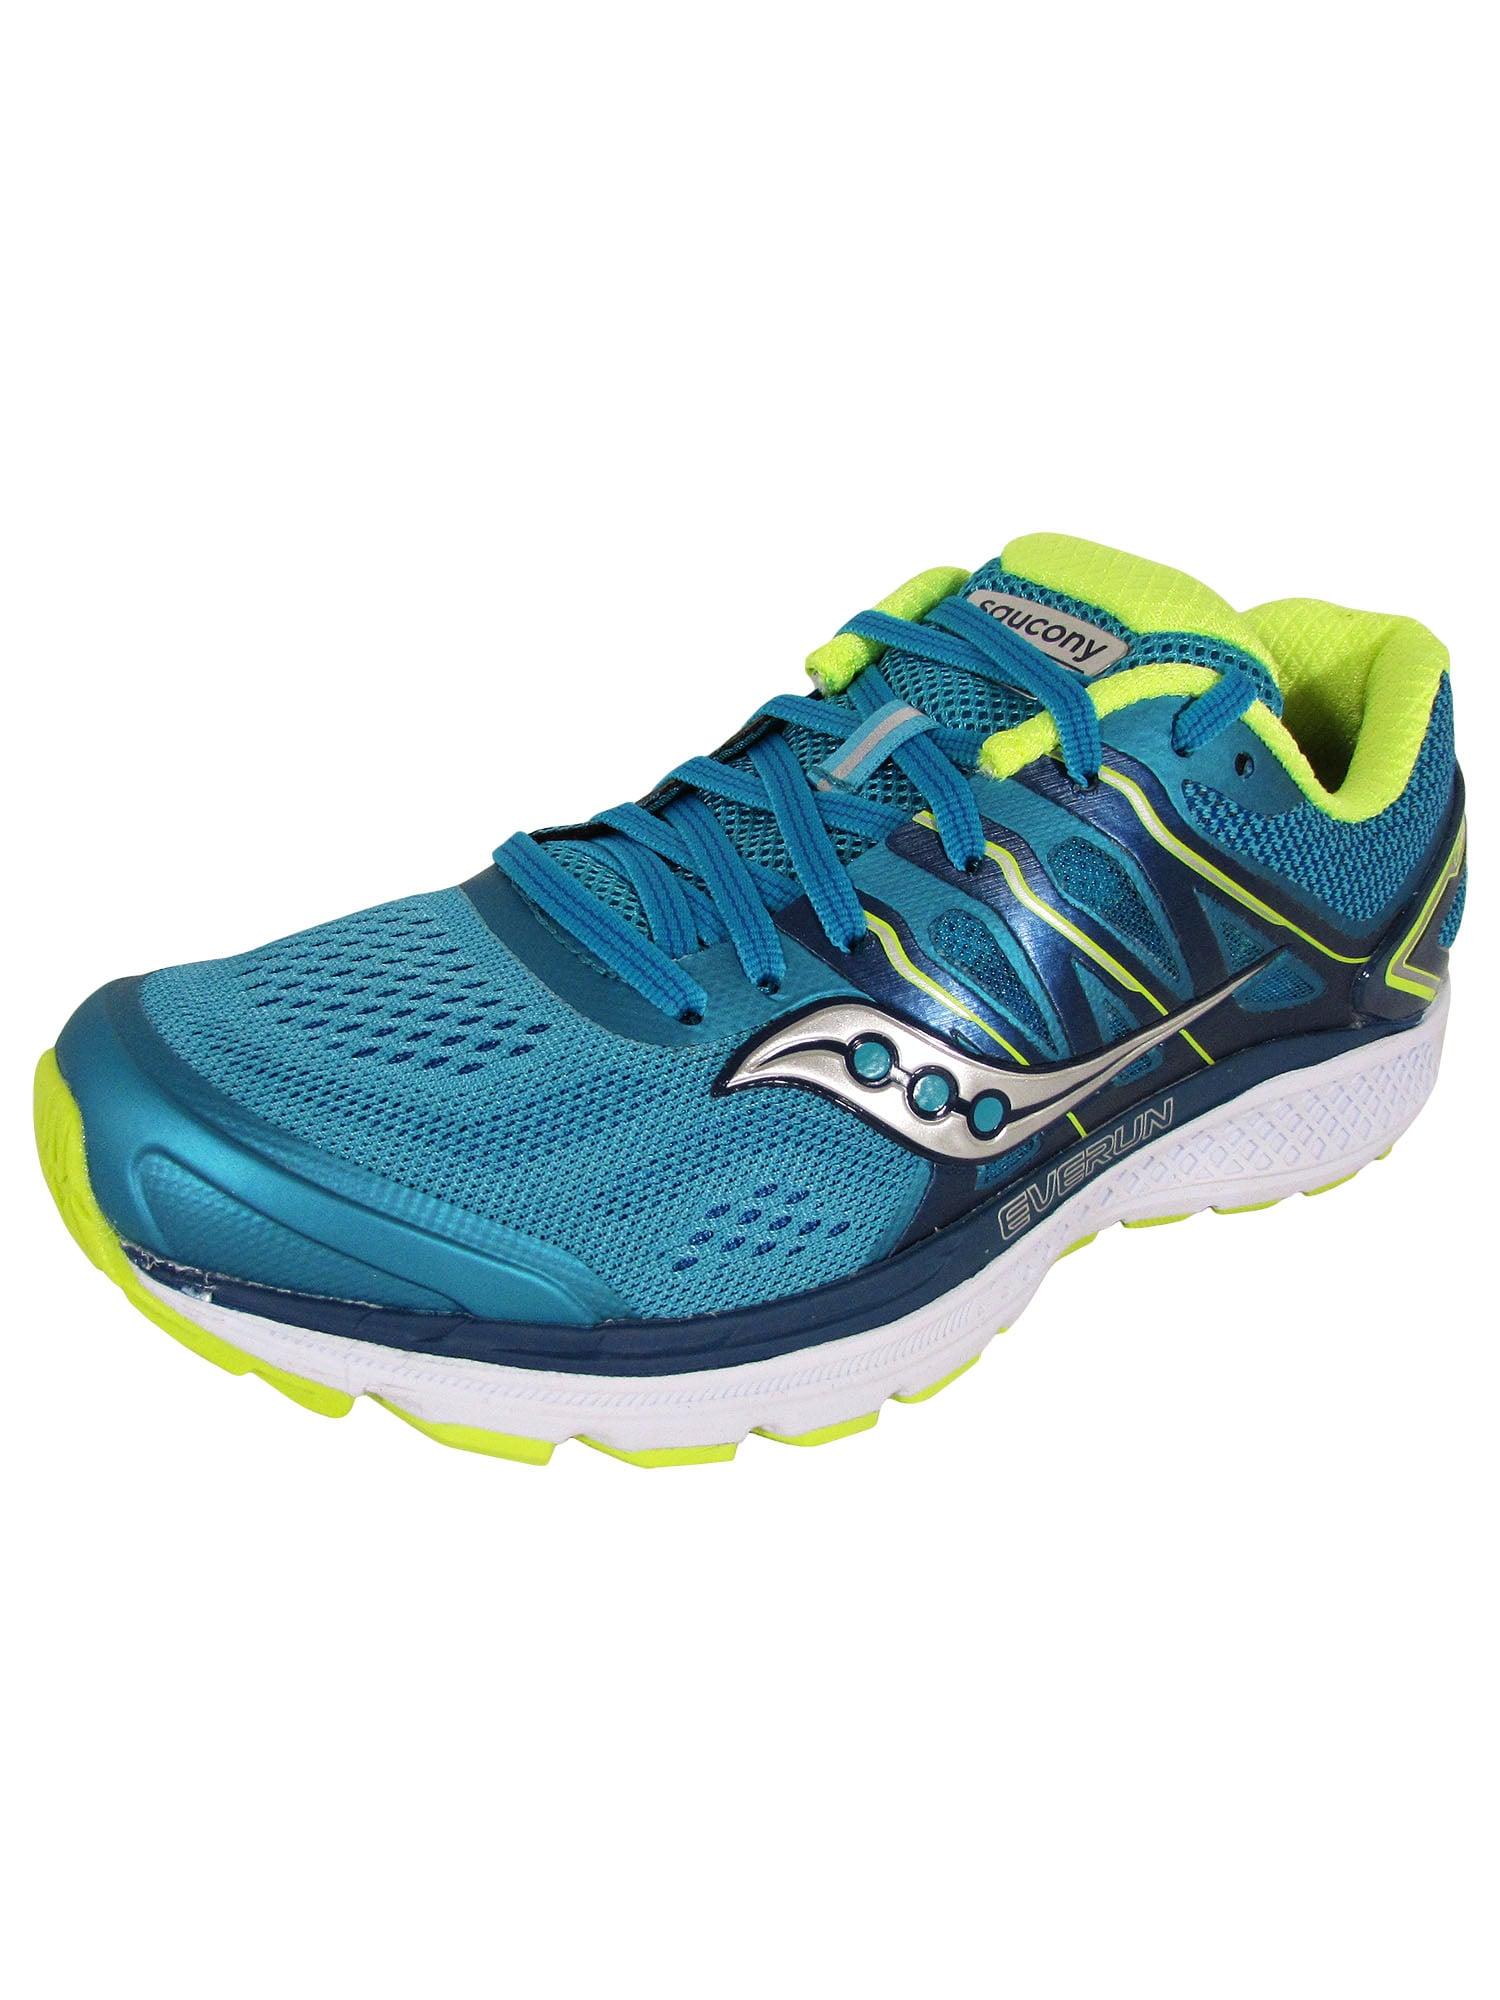 Saucony Omni 16 Running Sneakers | Just